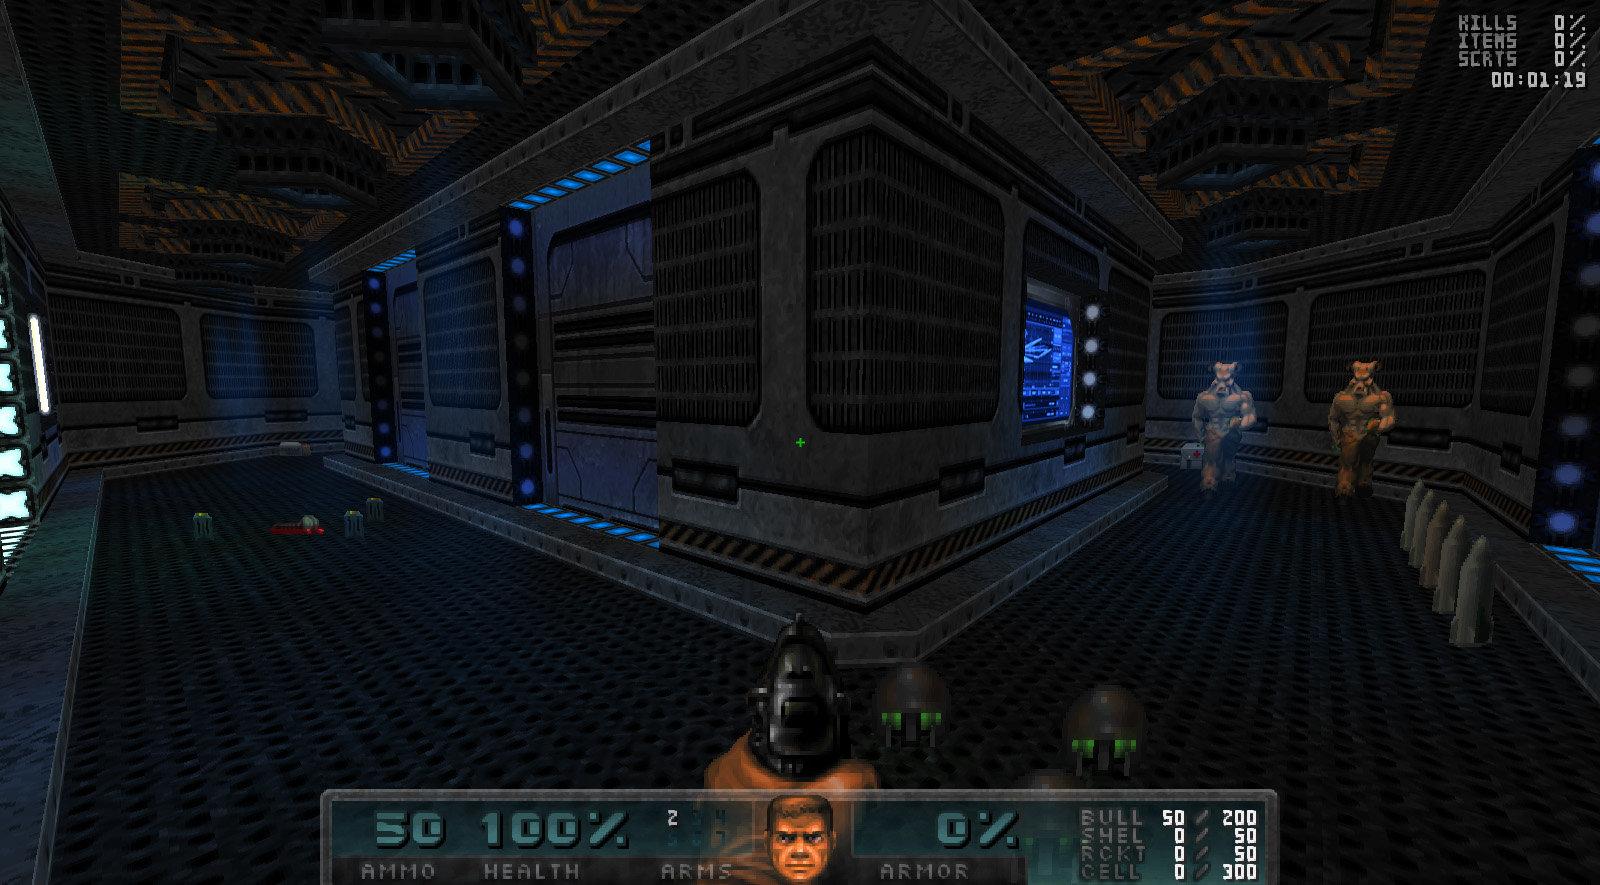 Screenshot_Doom_20200522_100707.jpg.f2b4a04a71a402d6d207c89b5ff7ebdd.jpg